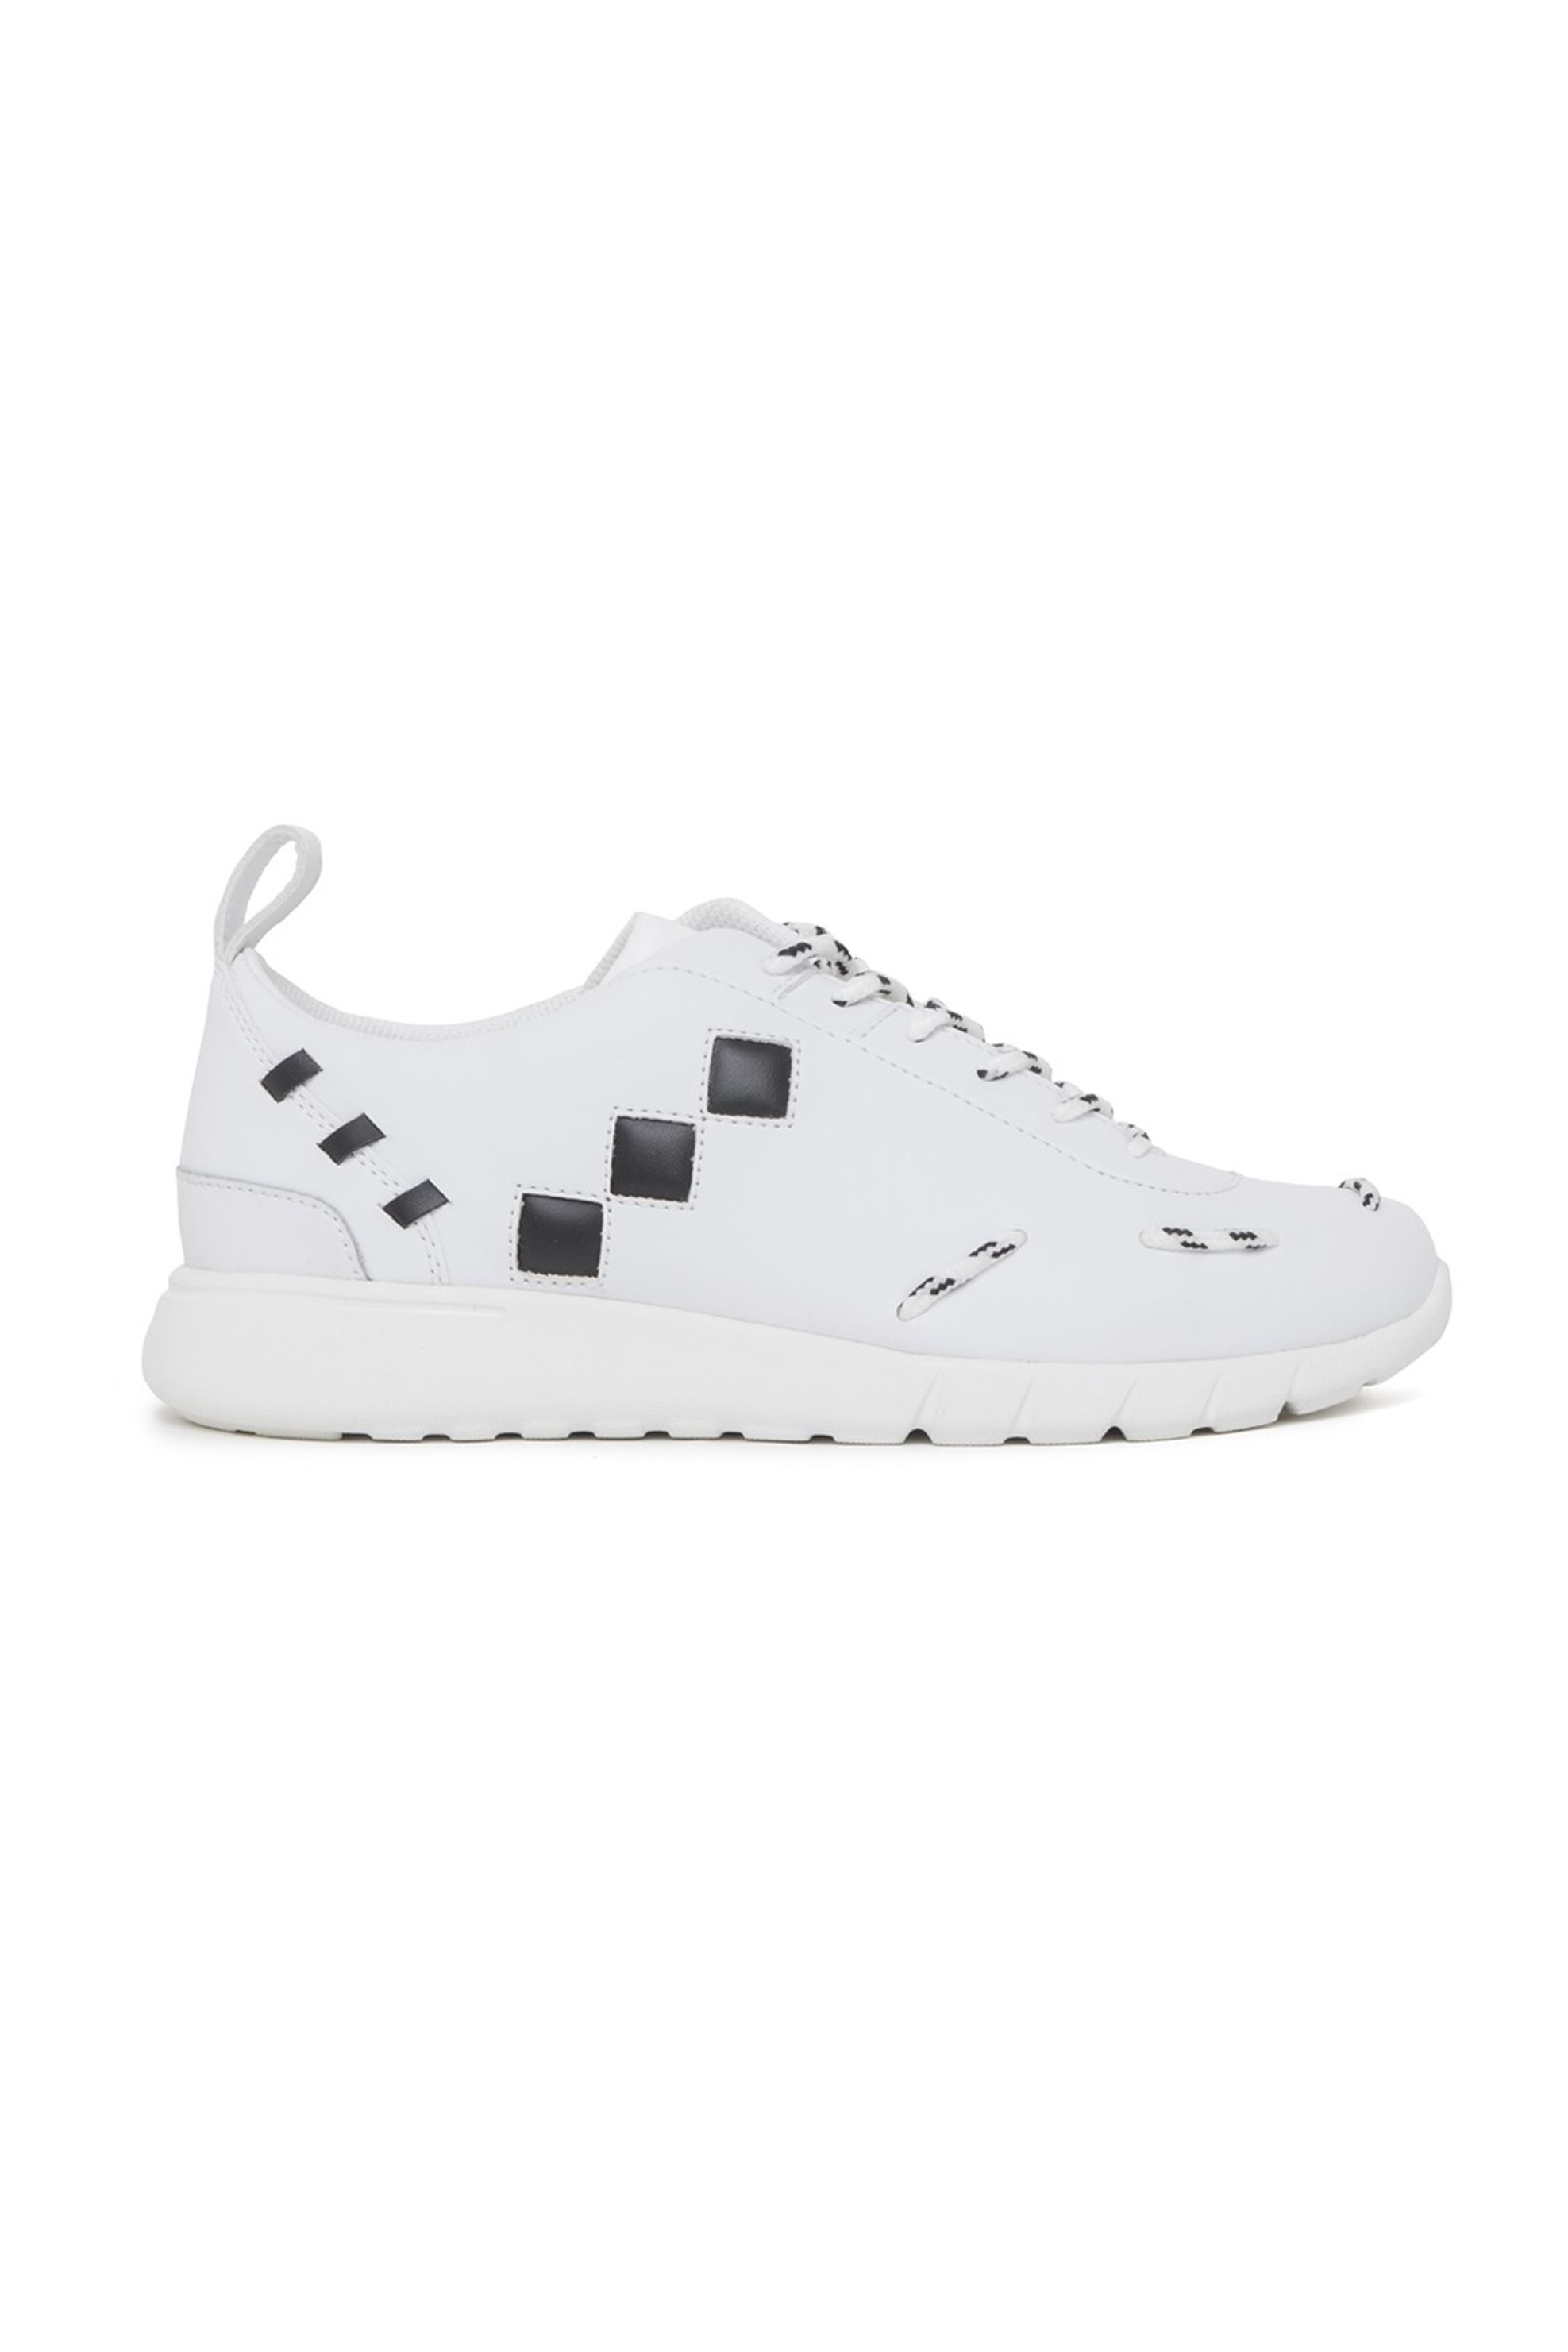 Trussardi ανδρικά sneakers με contrast λεπτομέρειες – 77A00138-9Y099999 – Λευκό